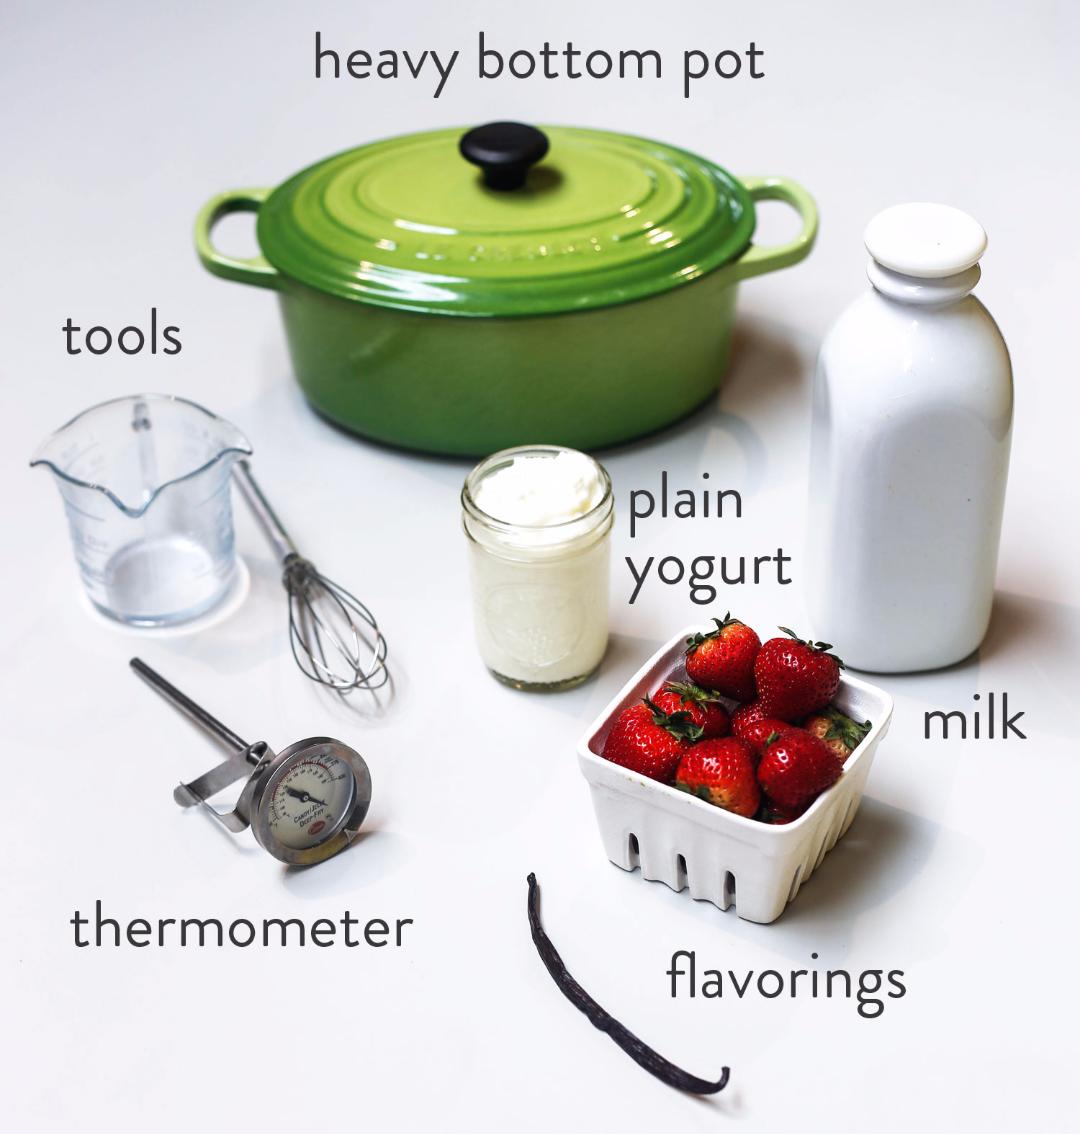 Ingredients needed: 1 cup plain yogurt 5 cups milk 1 handfull of fresh fruit (optional)  Materials needed: Thermometer (optional) wisk microwave  towel